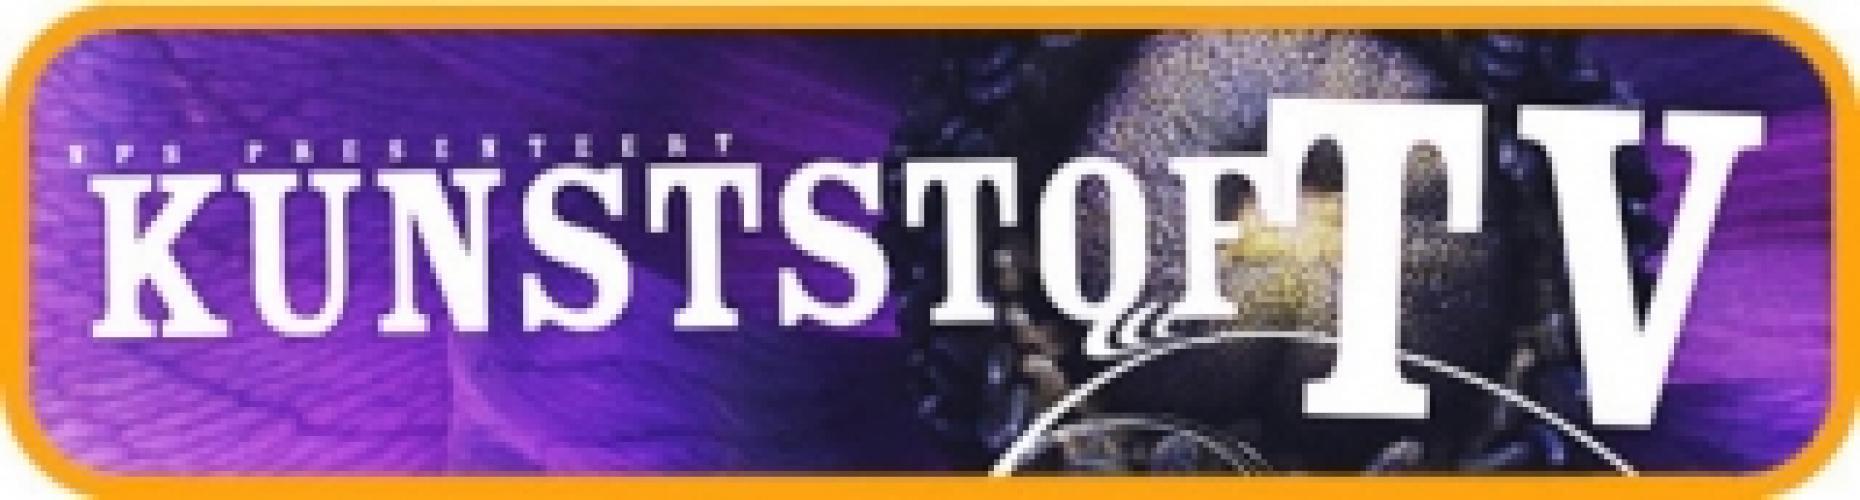 Kunststof TV next episode air date poster